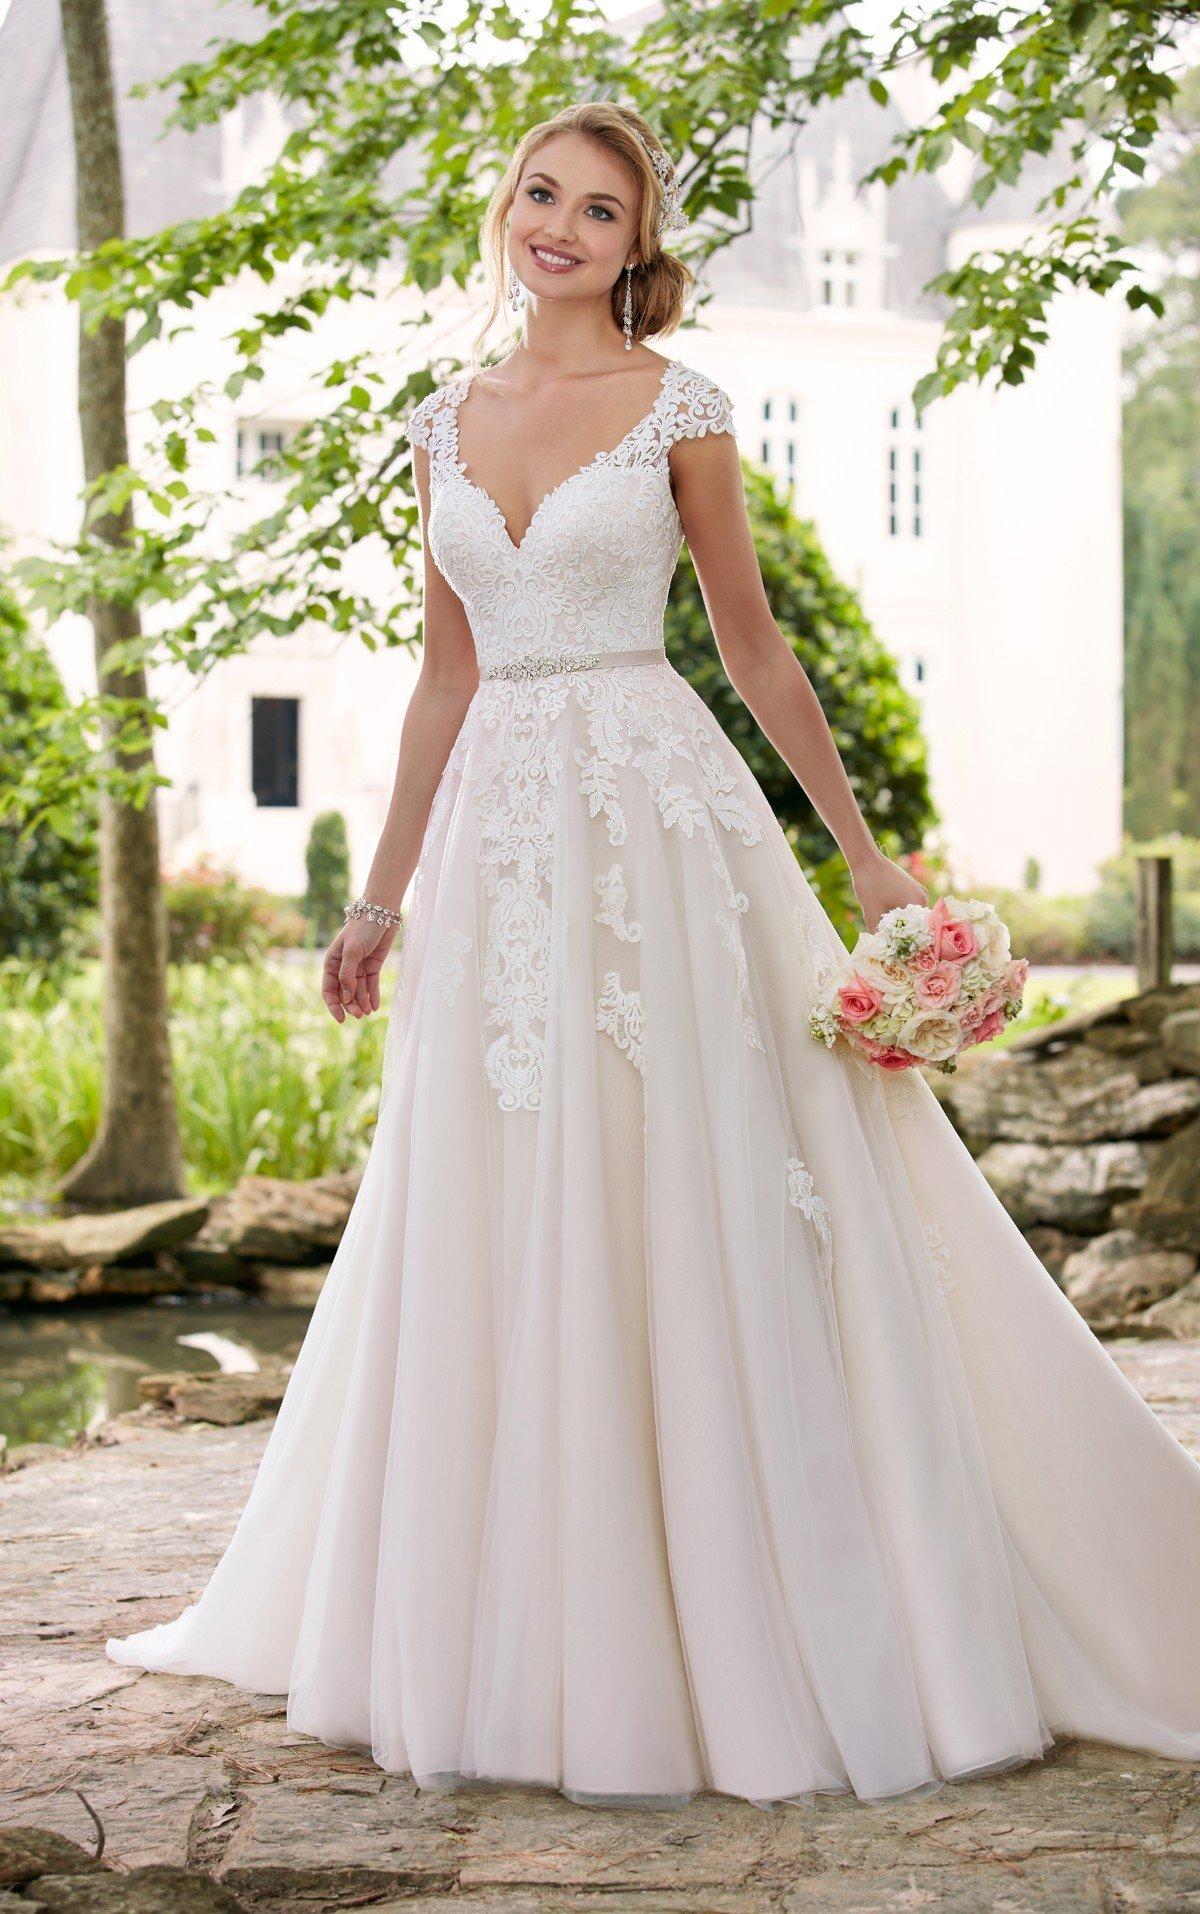 Bruidsmode Merk Uitgelicht Stella York Mijn Trouwpagina